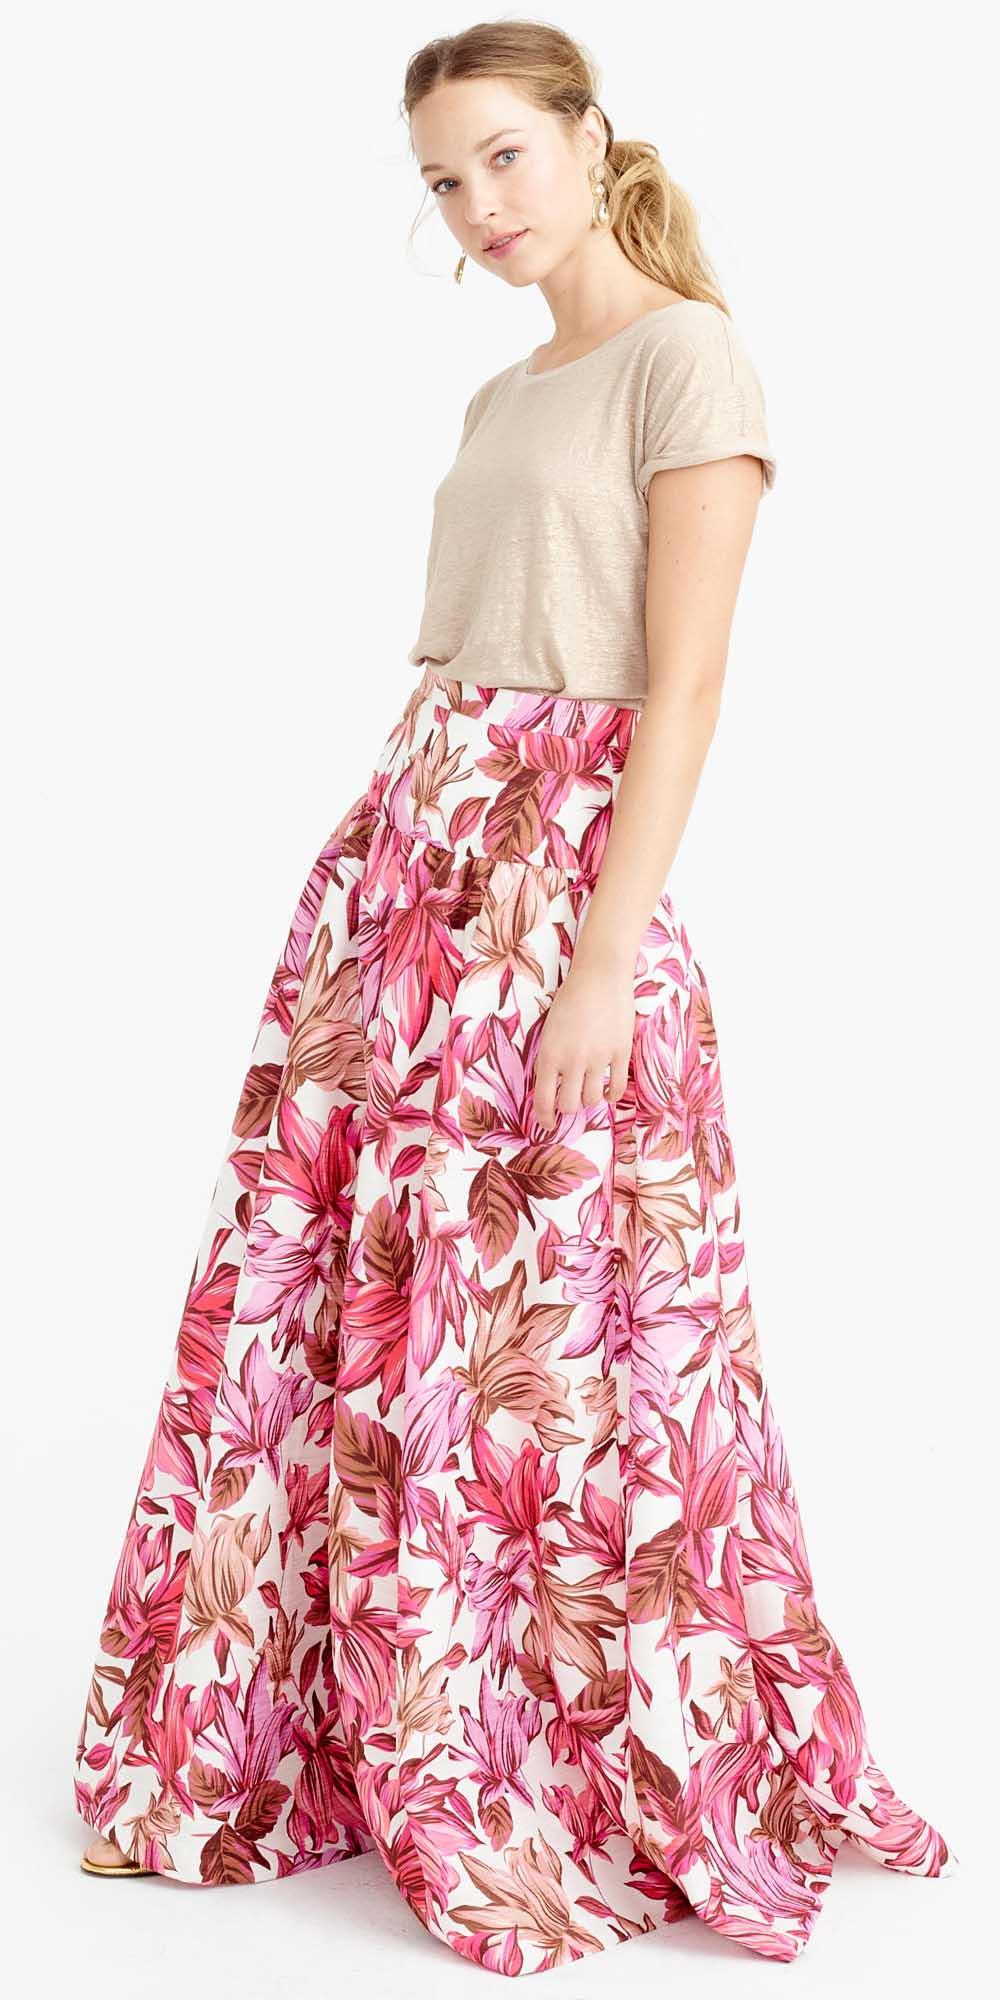 tan-tee-print-jcrew-blonde-pony-pink-magenta-maxi-skirt-spring-summer-dinner.jpg